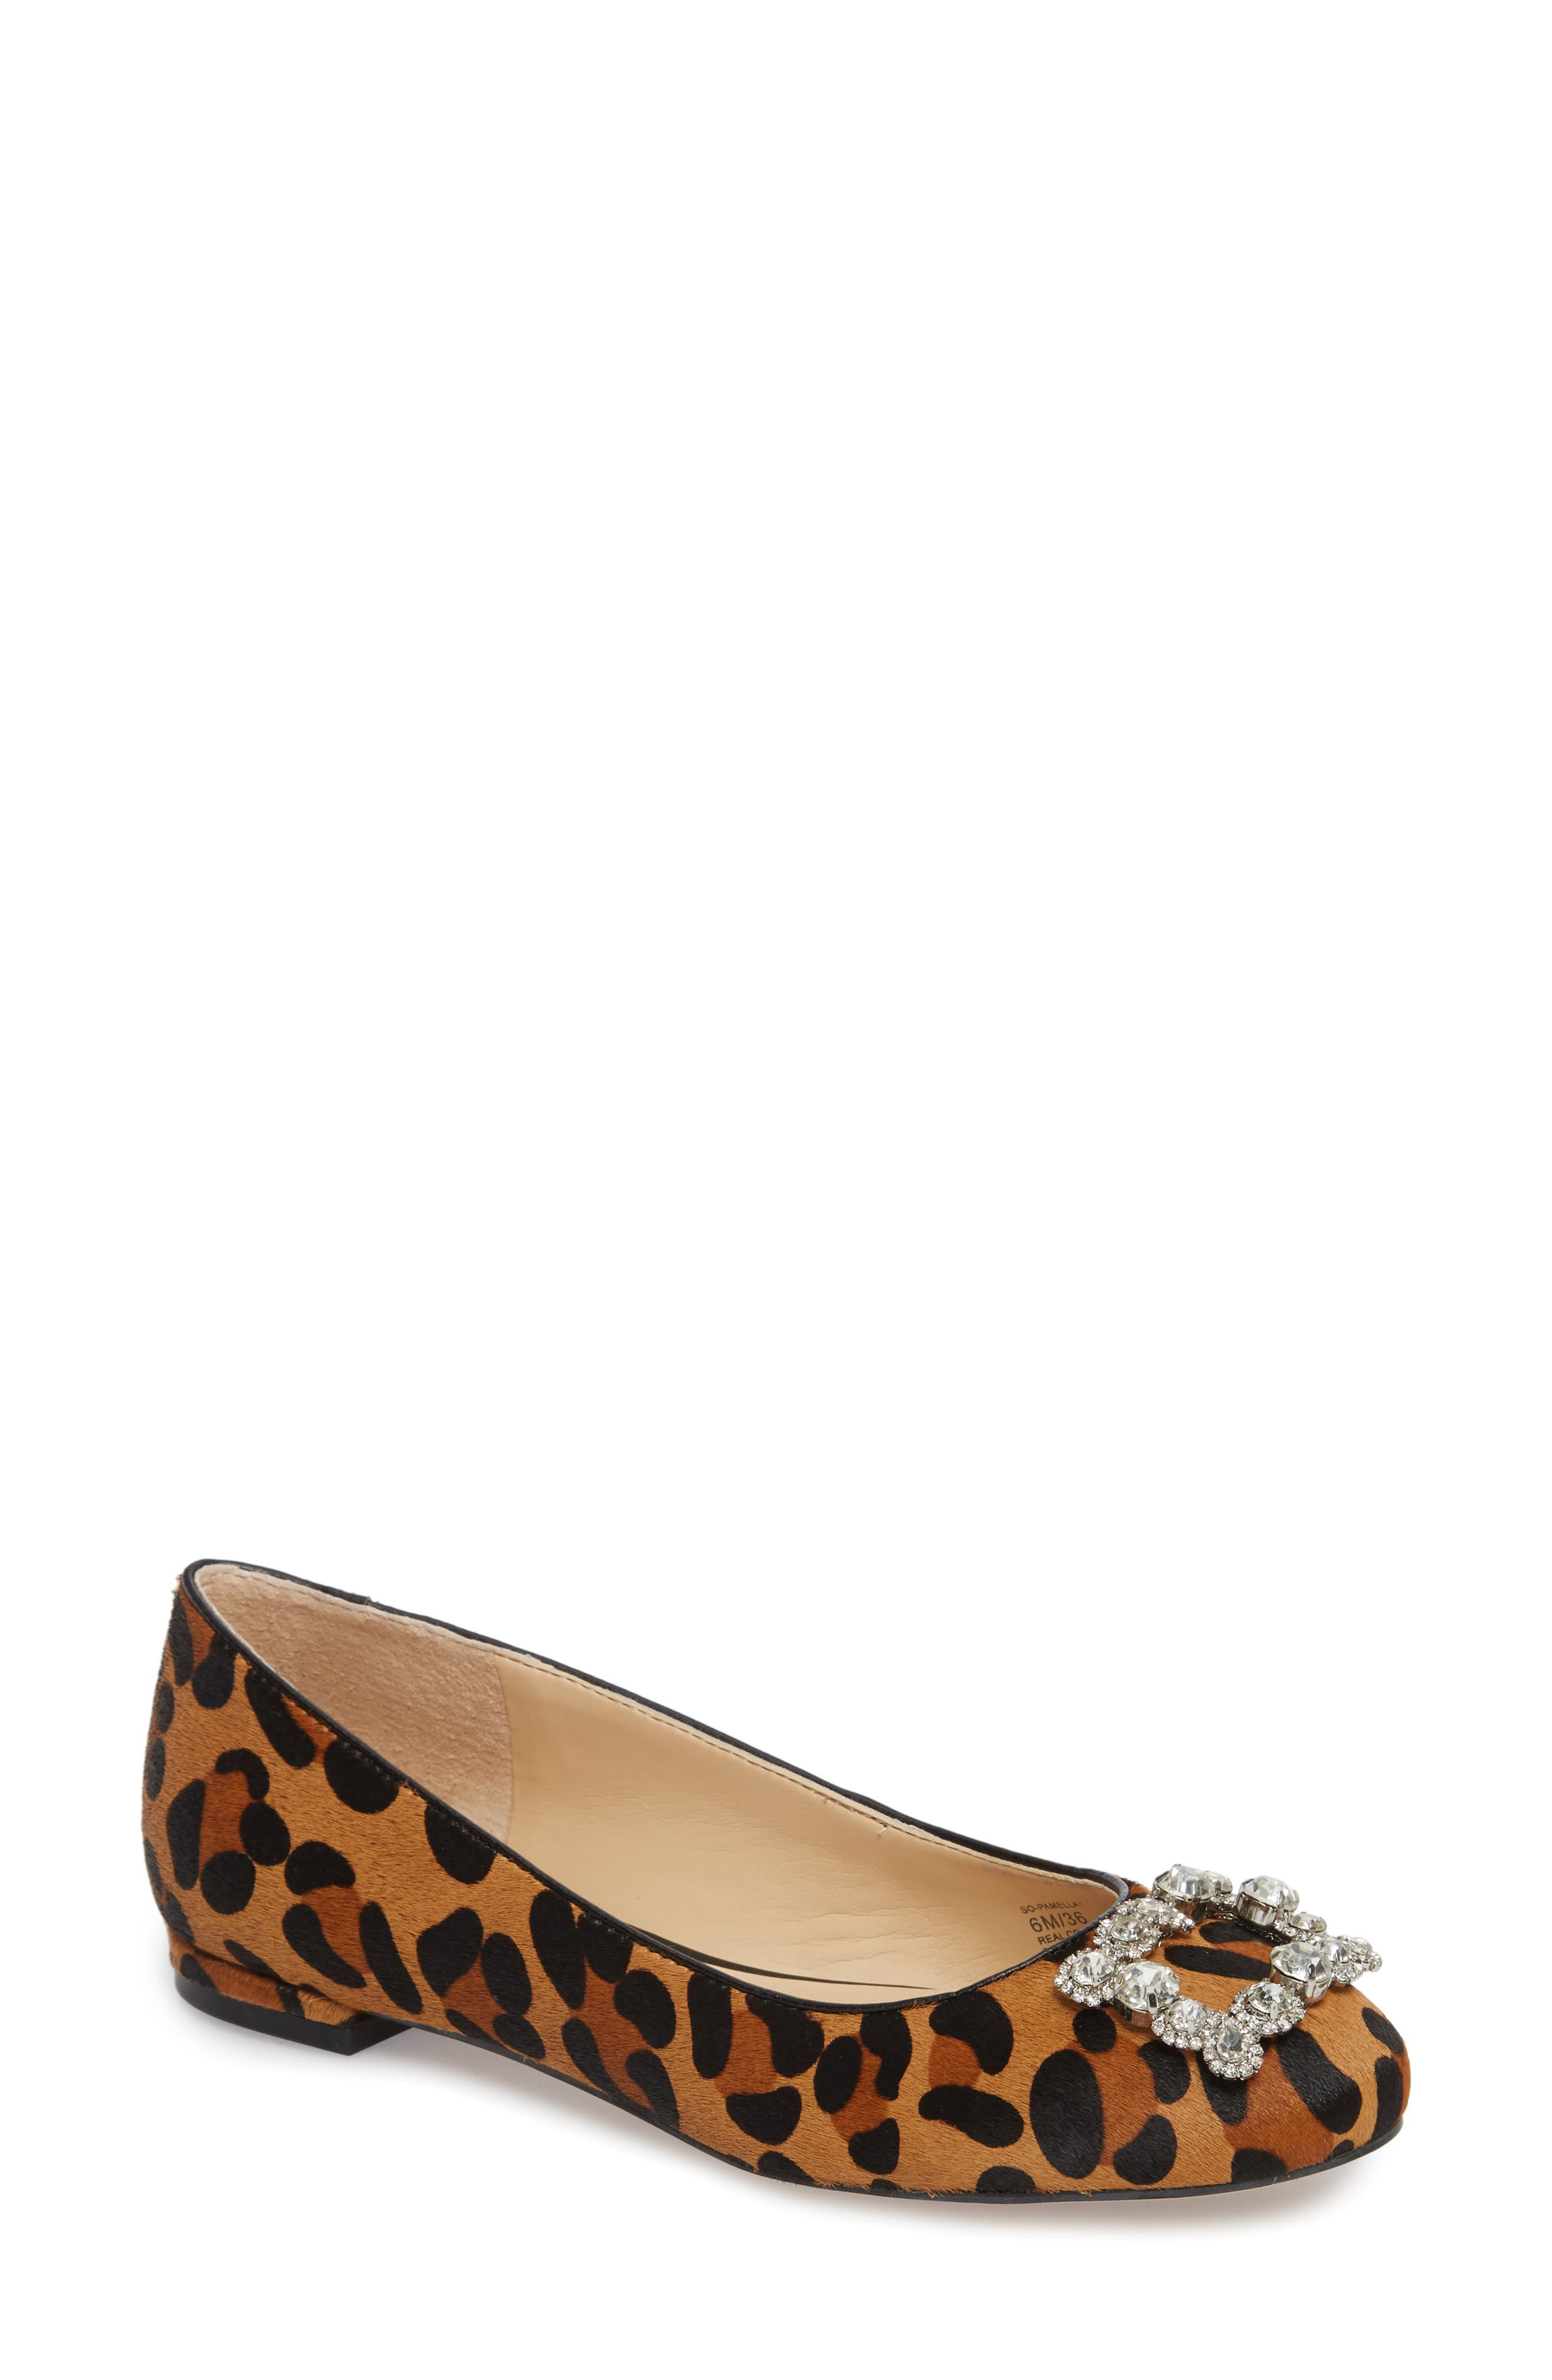 Pamella Ballet Flat,                             Main thumbnail 1, color,                             Leopard